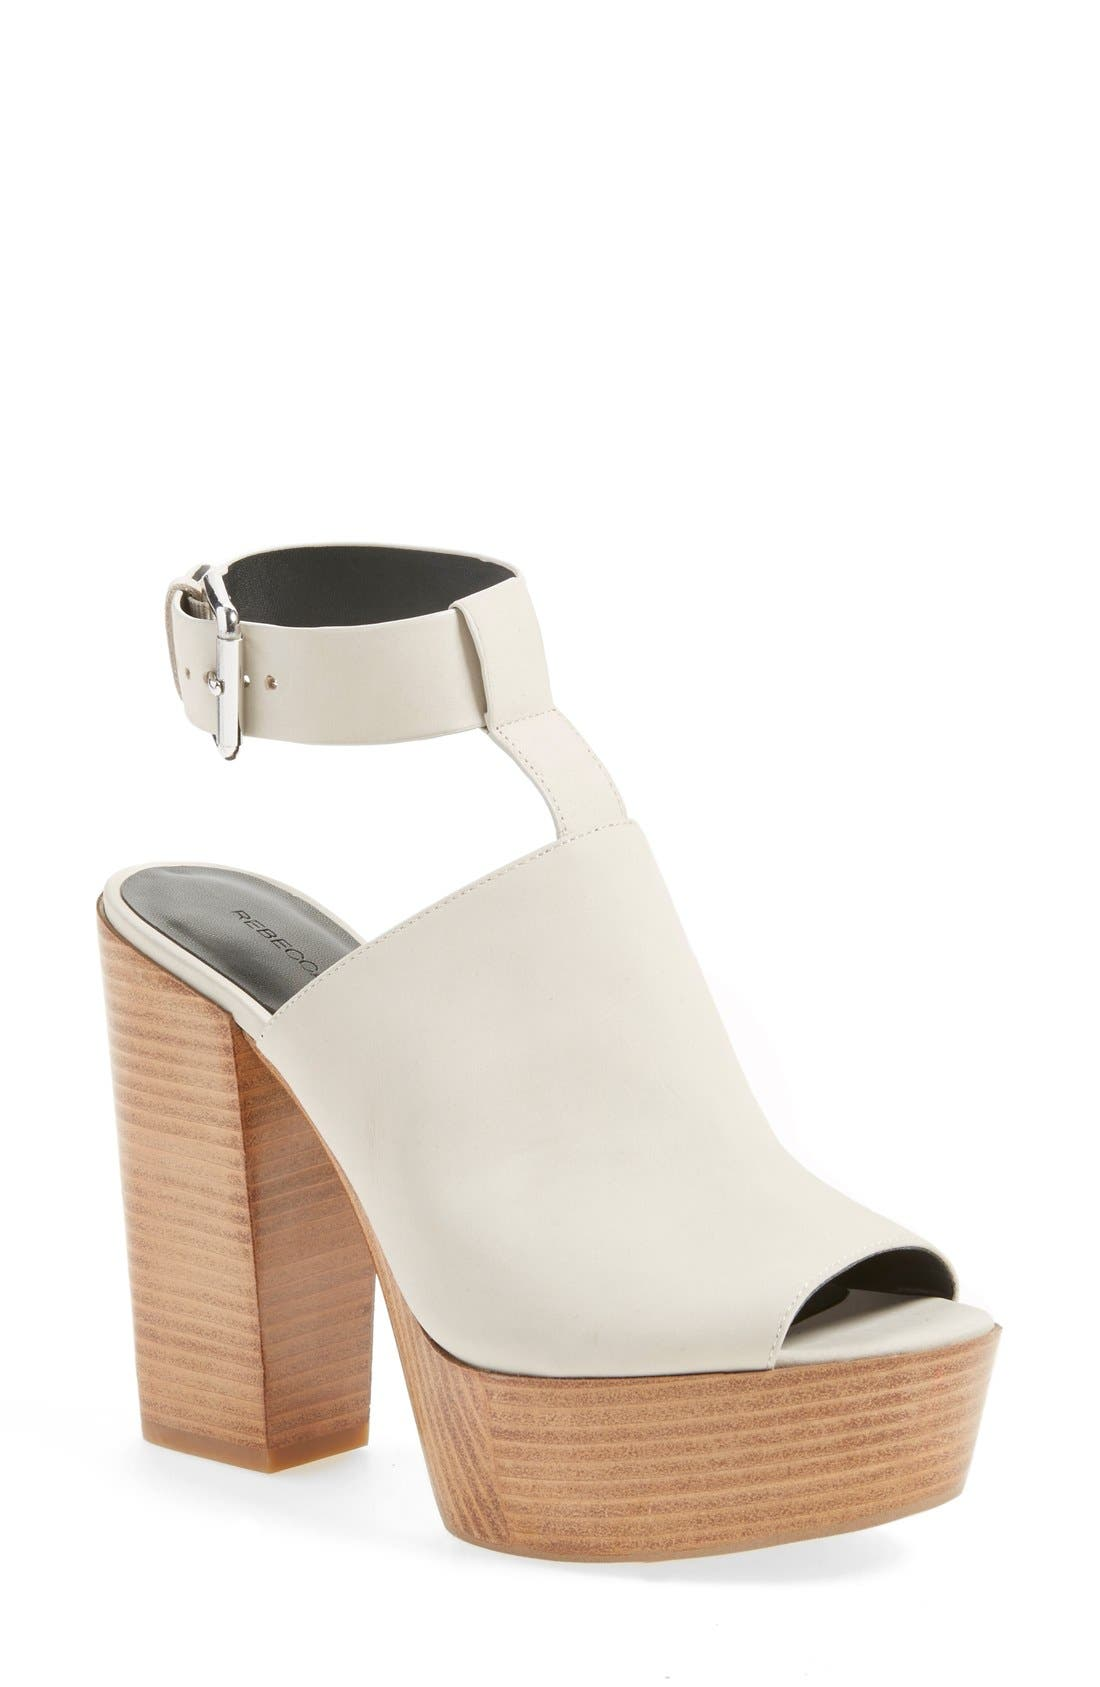 Main Image - Rebecca Minkoff 'Cece' Platform Sandal (Women)